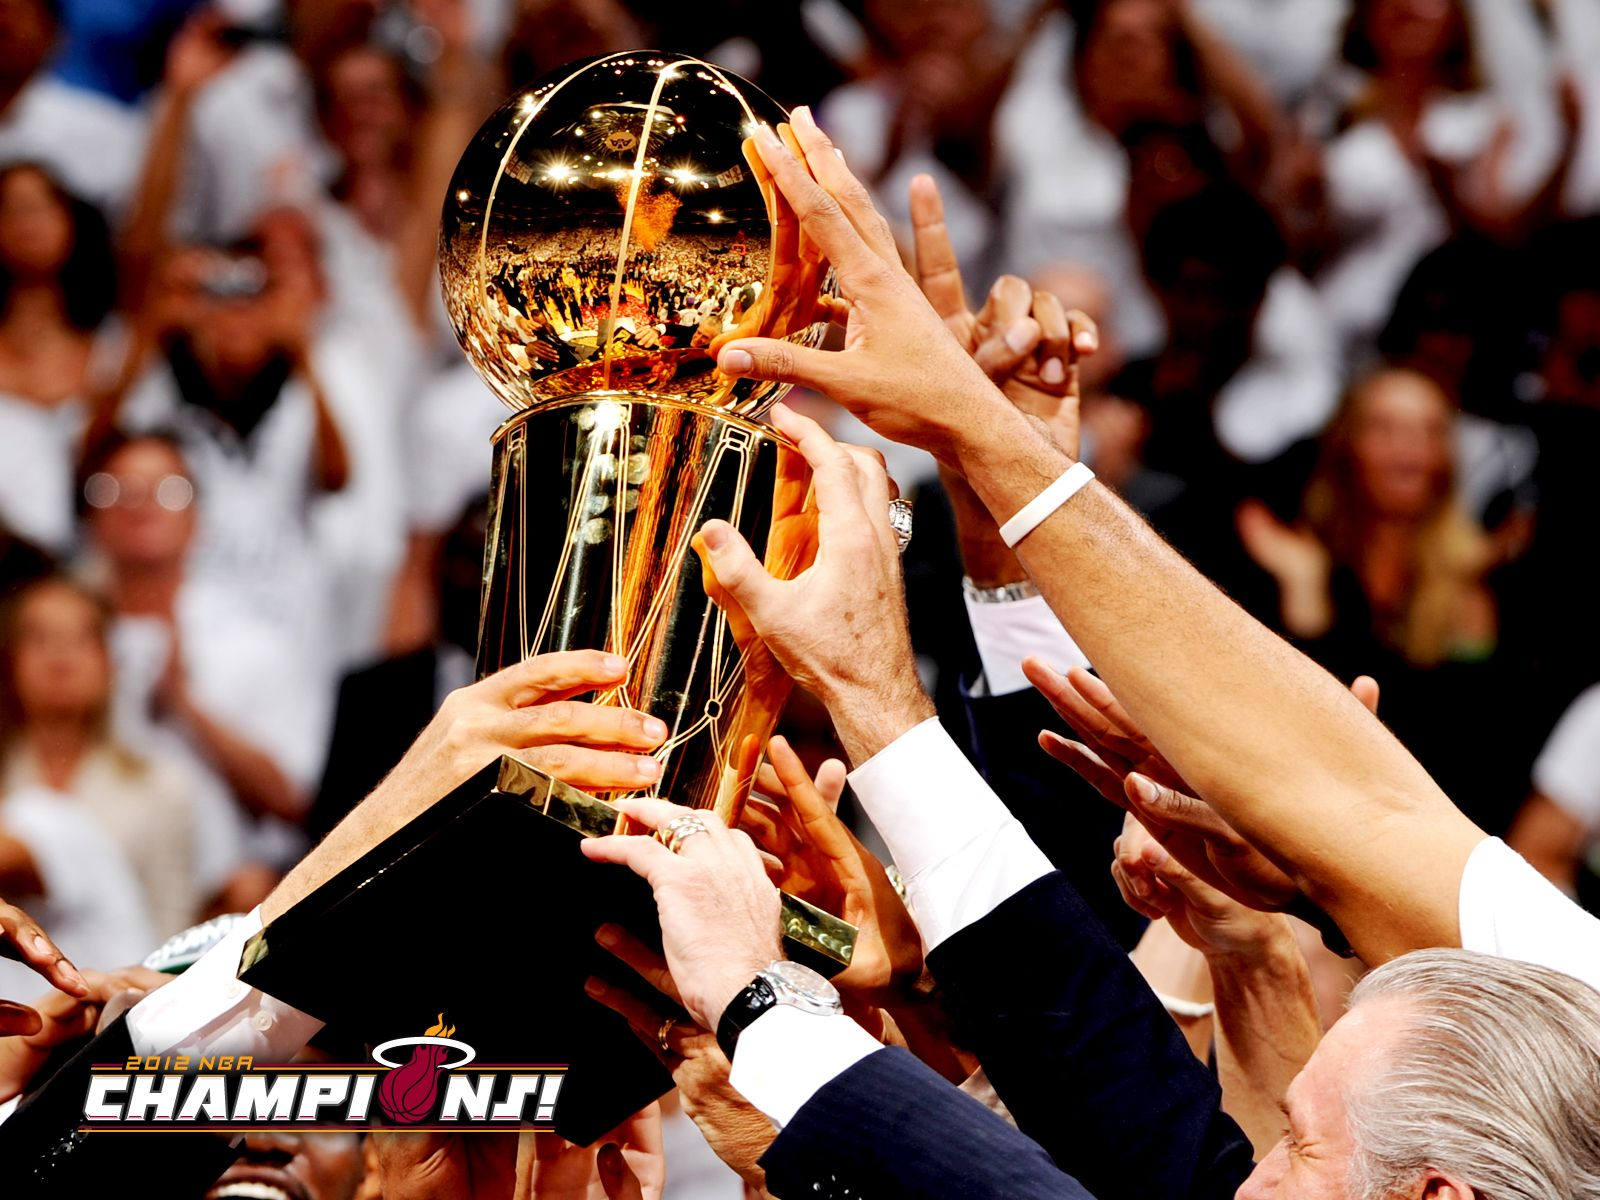 2012 NBA Champions Nba, Nba playoffs, Nba championships